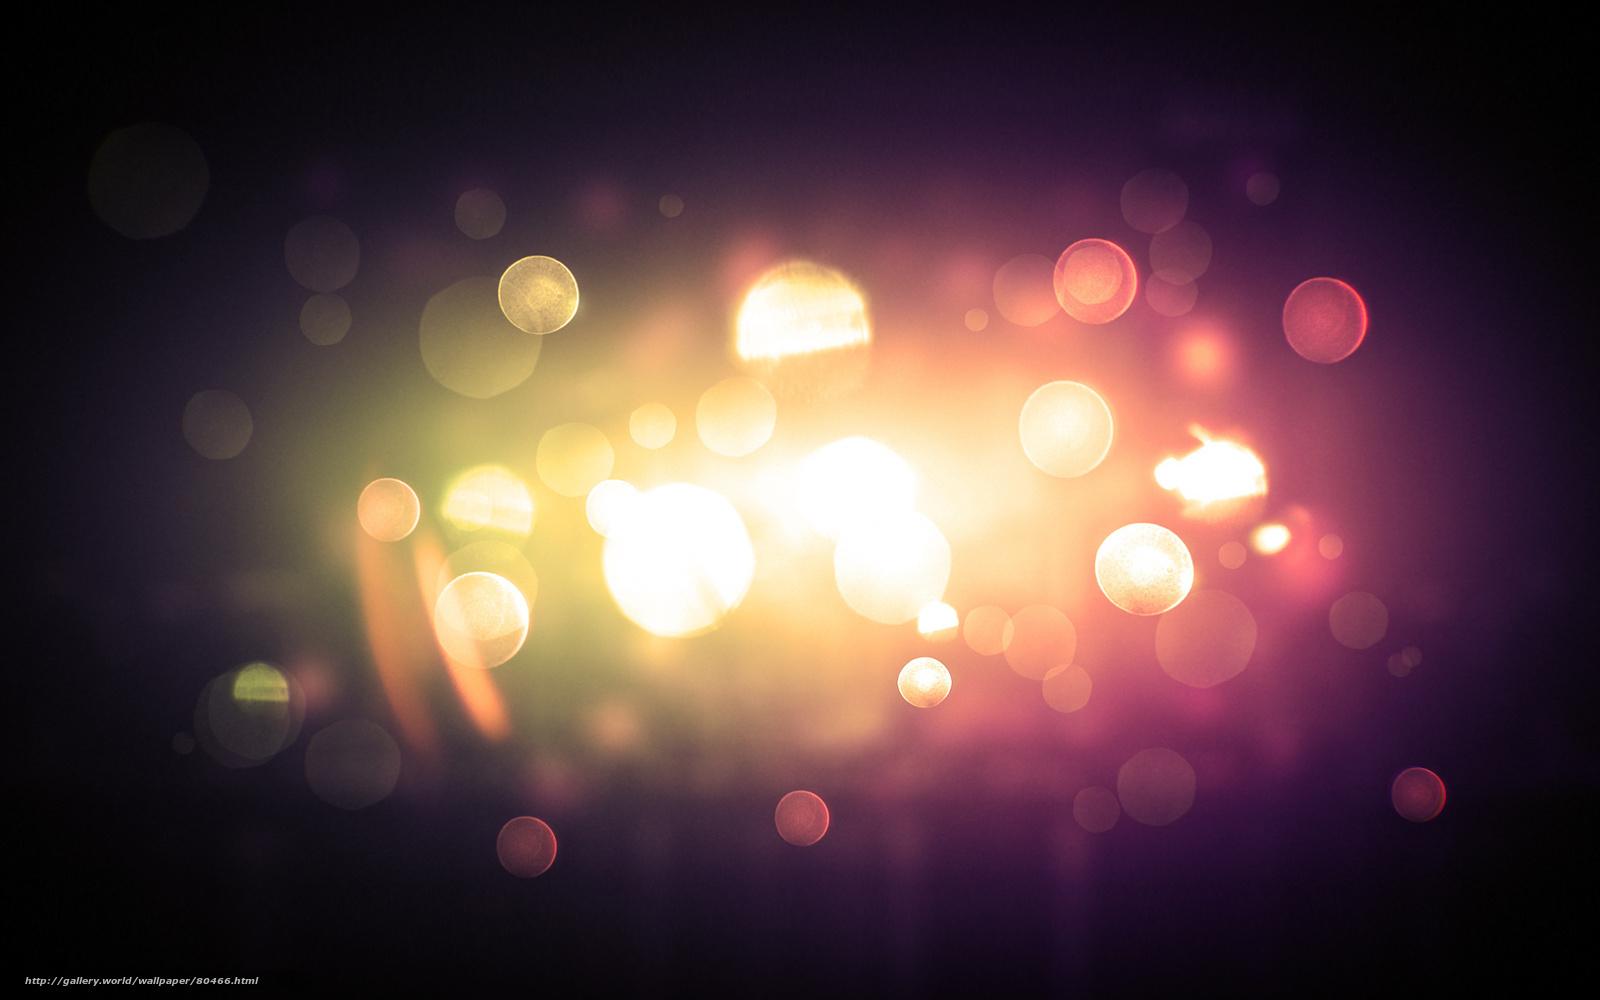 3 Ways to Adjust Brightness in Photoshop - wikiHow